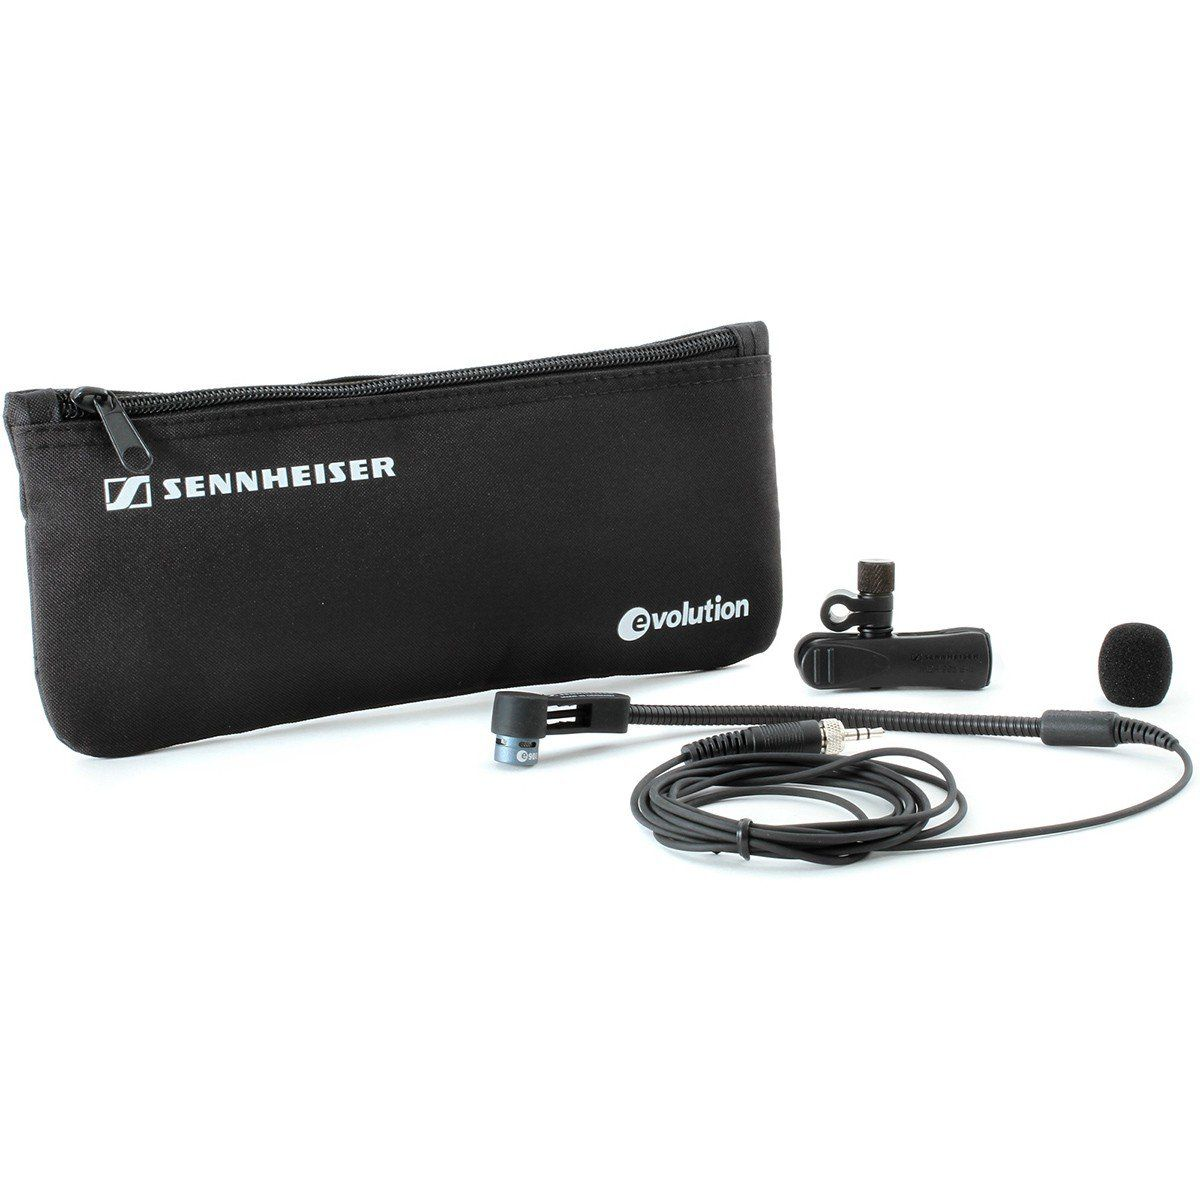 Sennheiser E908B/Ew Microfone Sennheiser E 908B Ew para Instrumentos